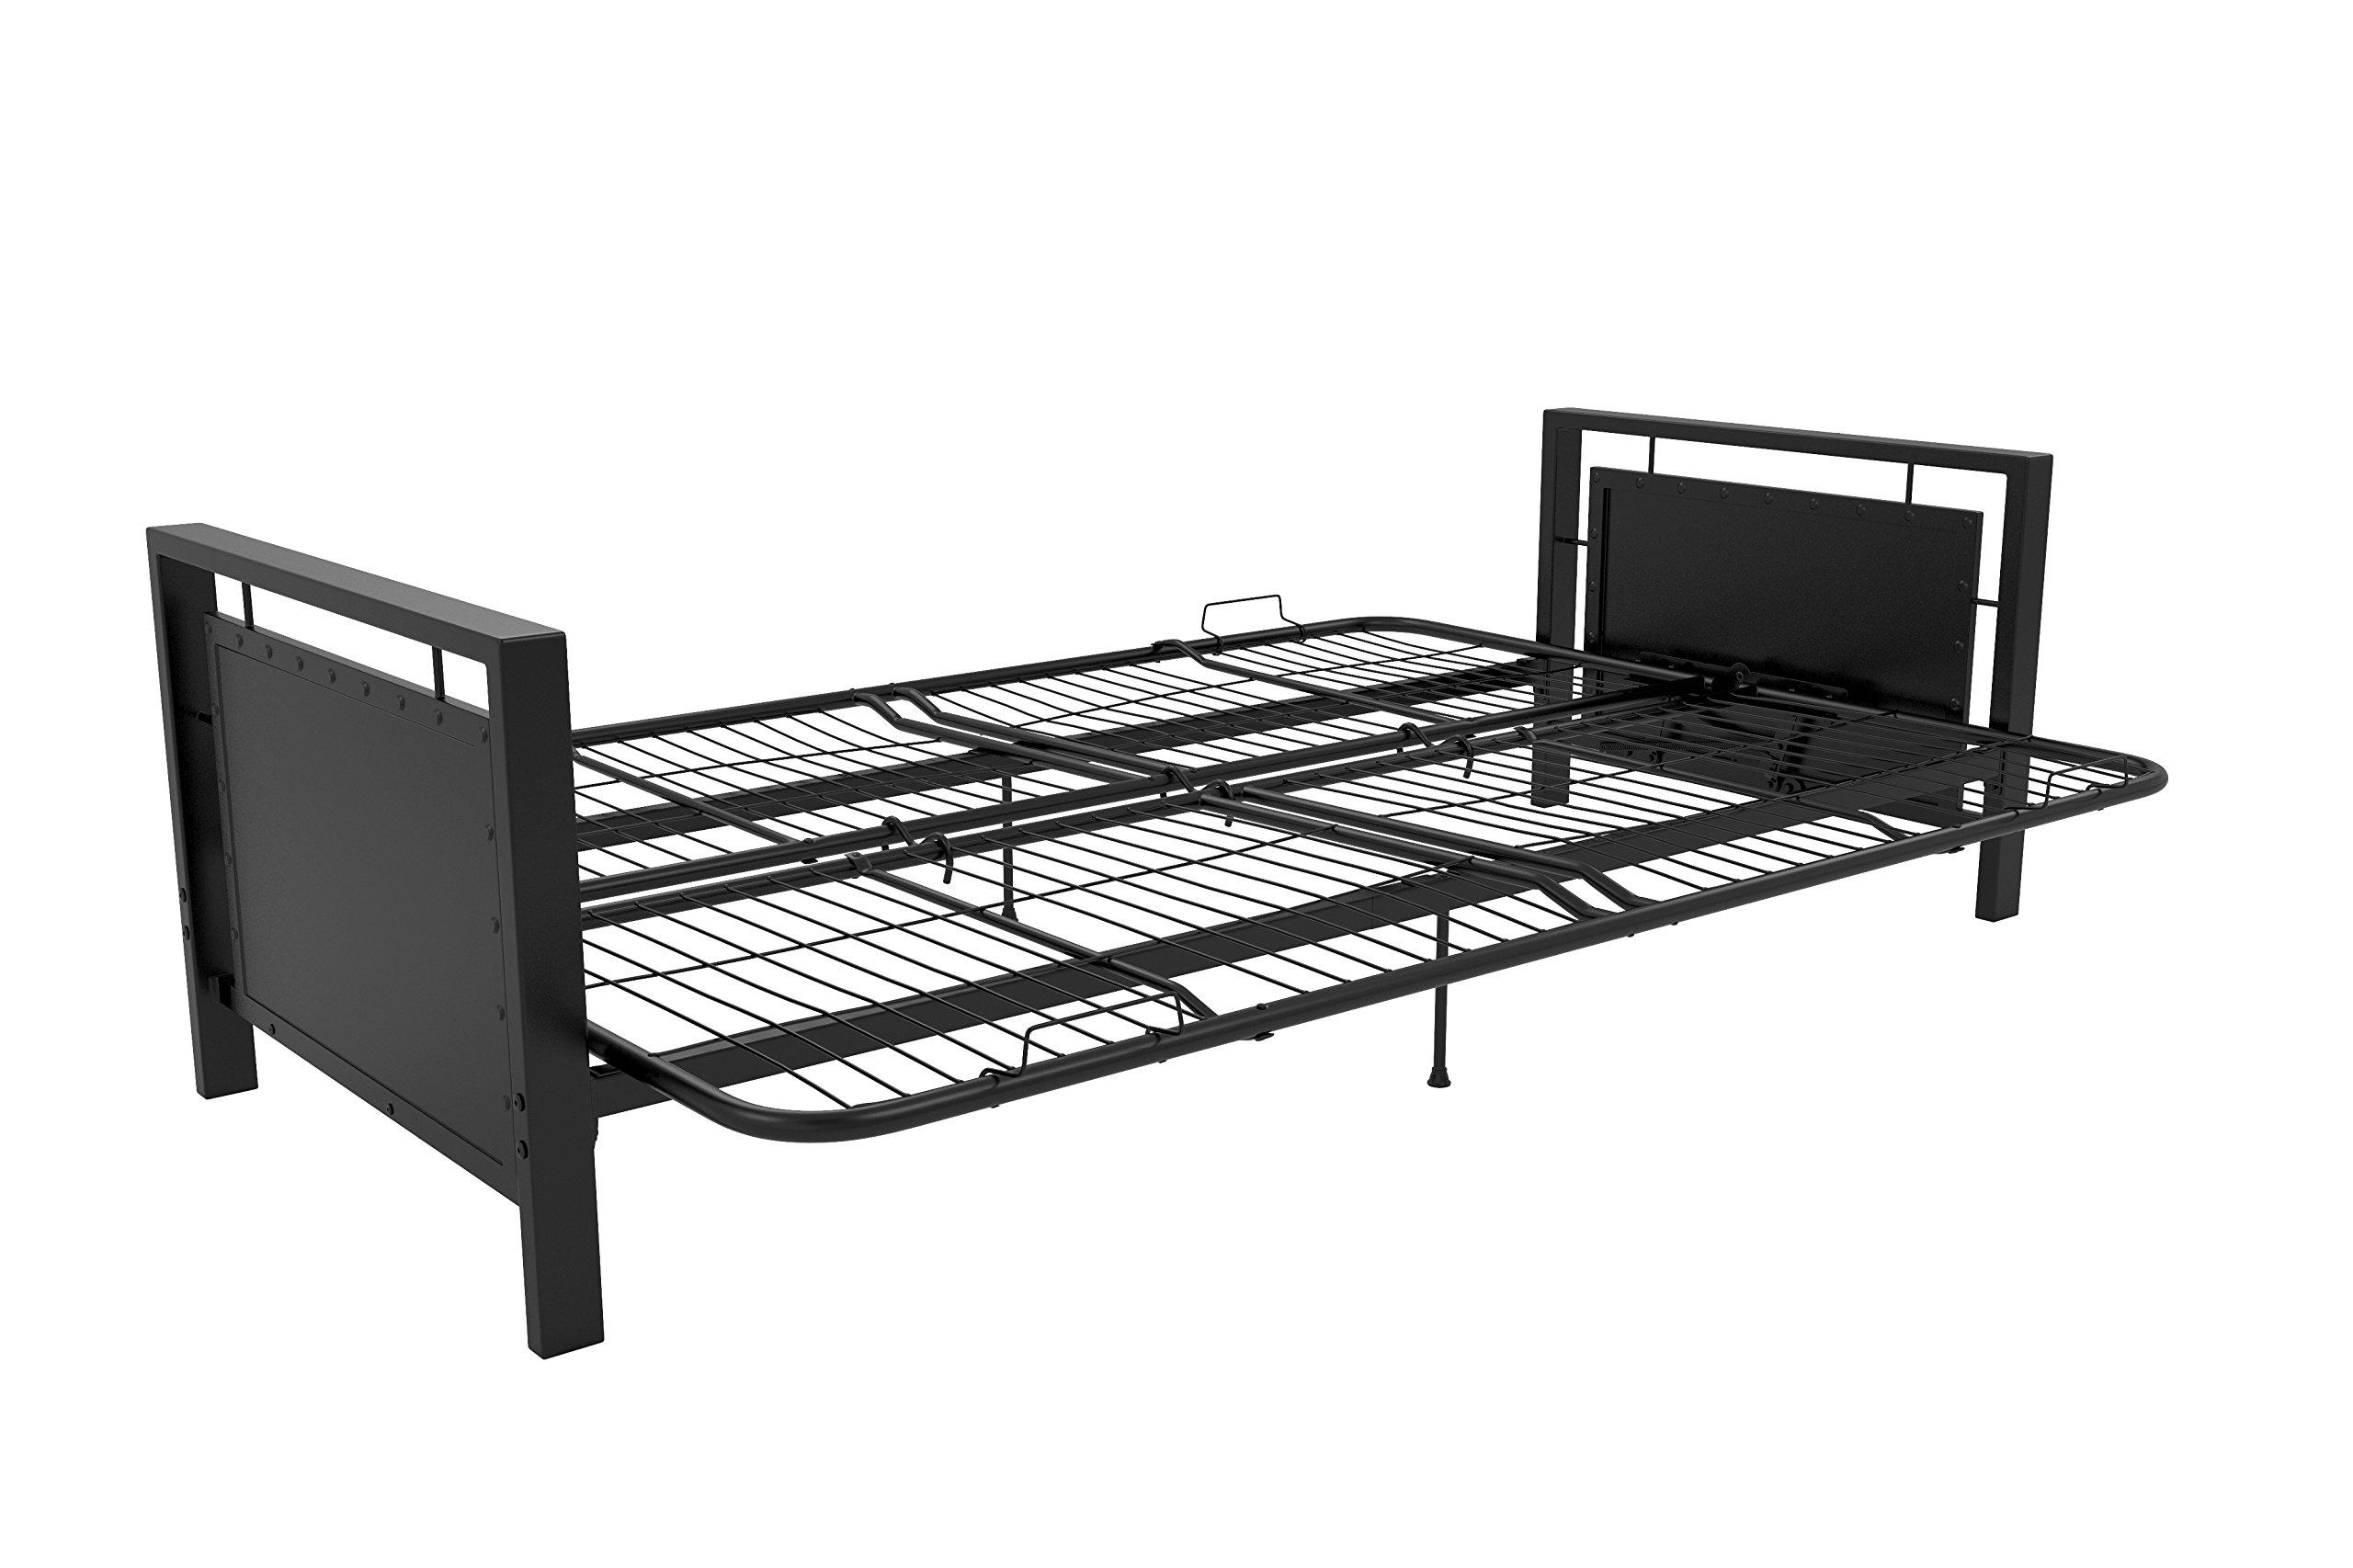 DHP Henley Metal Arm Futon Frame, Industrial Loft Design, Converts to Sleeper, Black Sturdy Metal by DHP (Image #2)